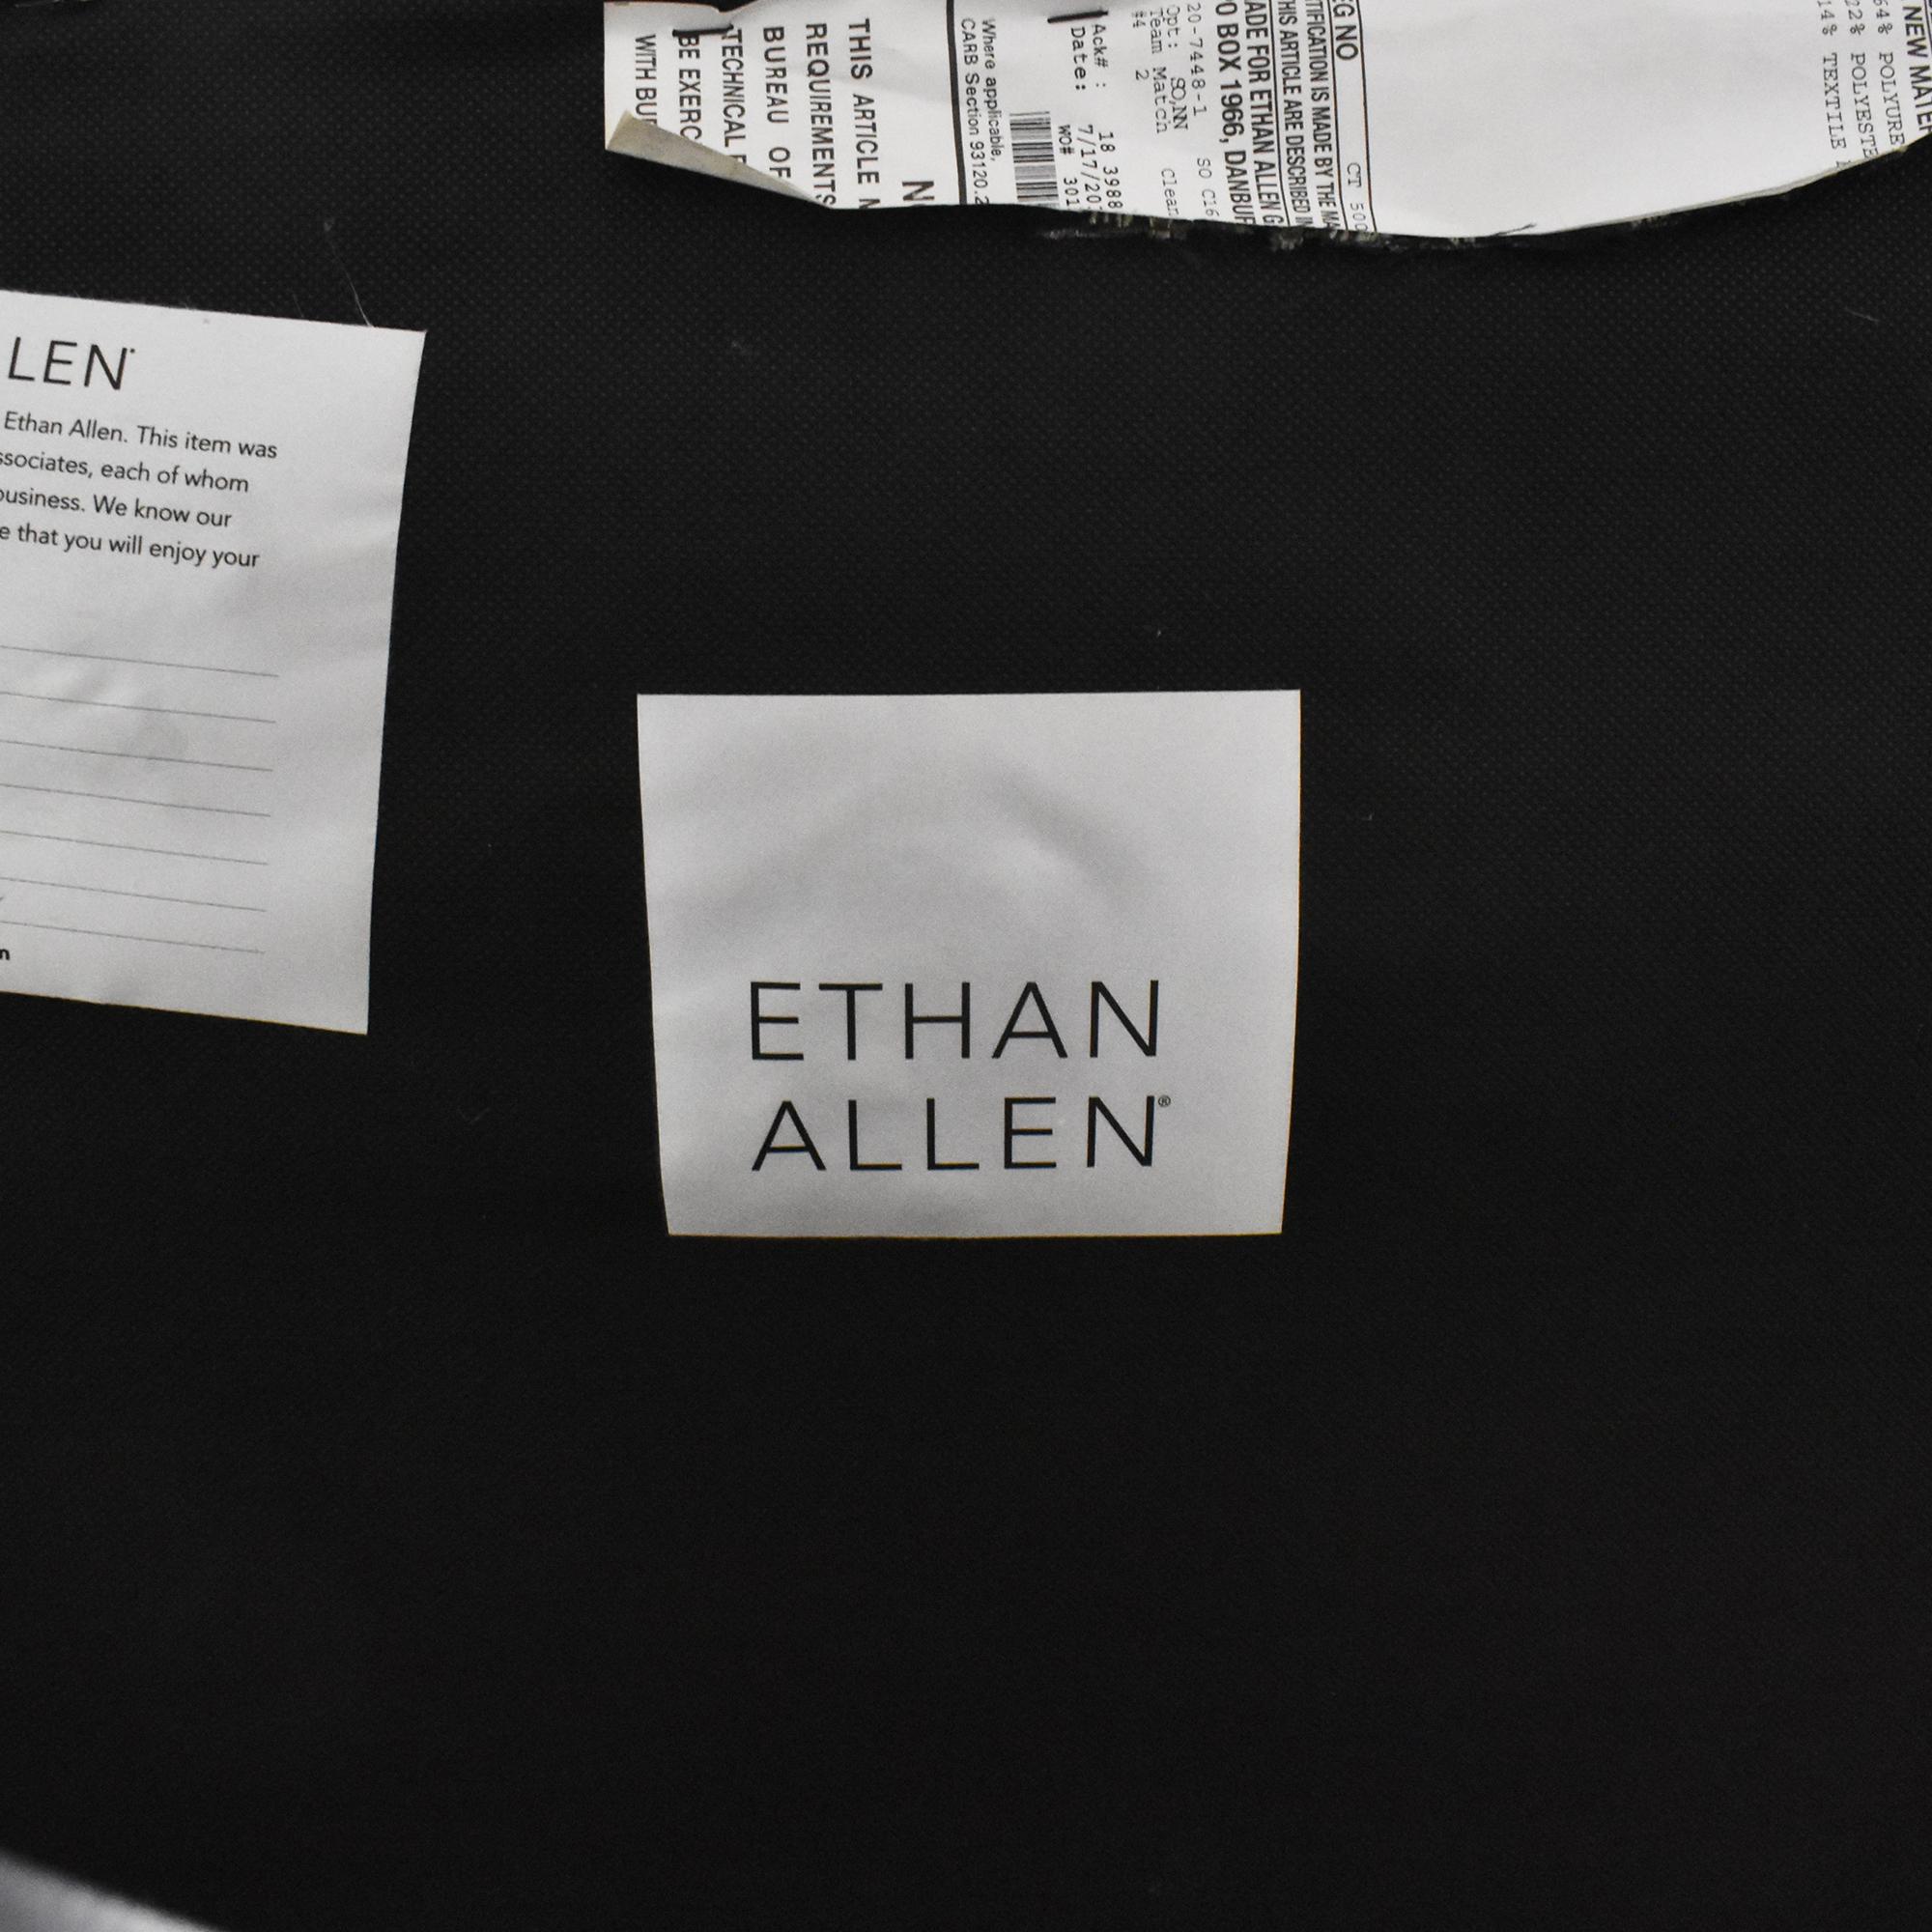 Ethan Allen Ethan Allen Upholstered Bench Benches